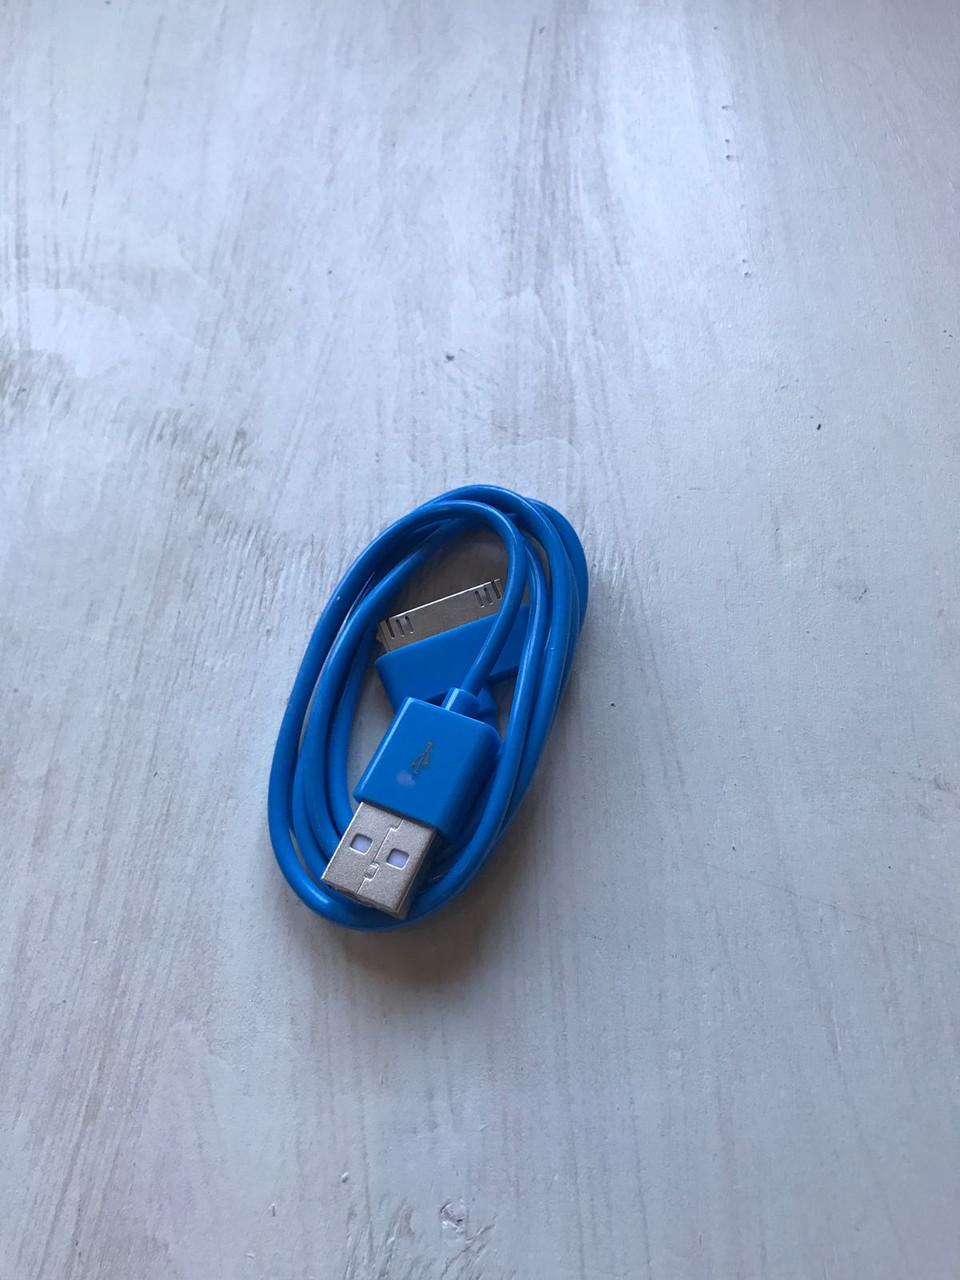 USB Charge Cable синего цвета для iPhone 4/4s